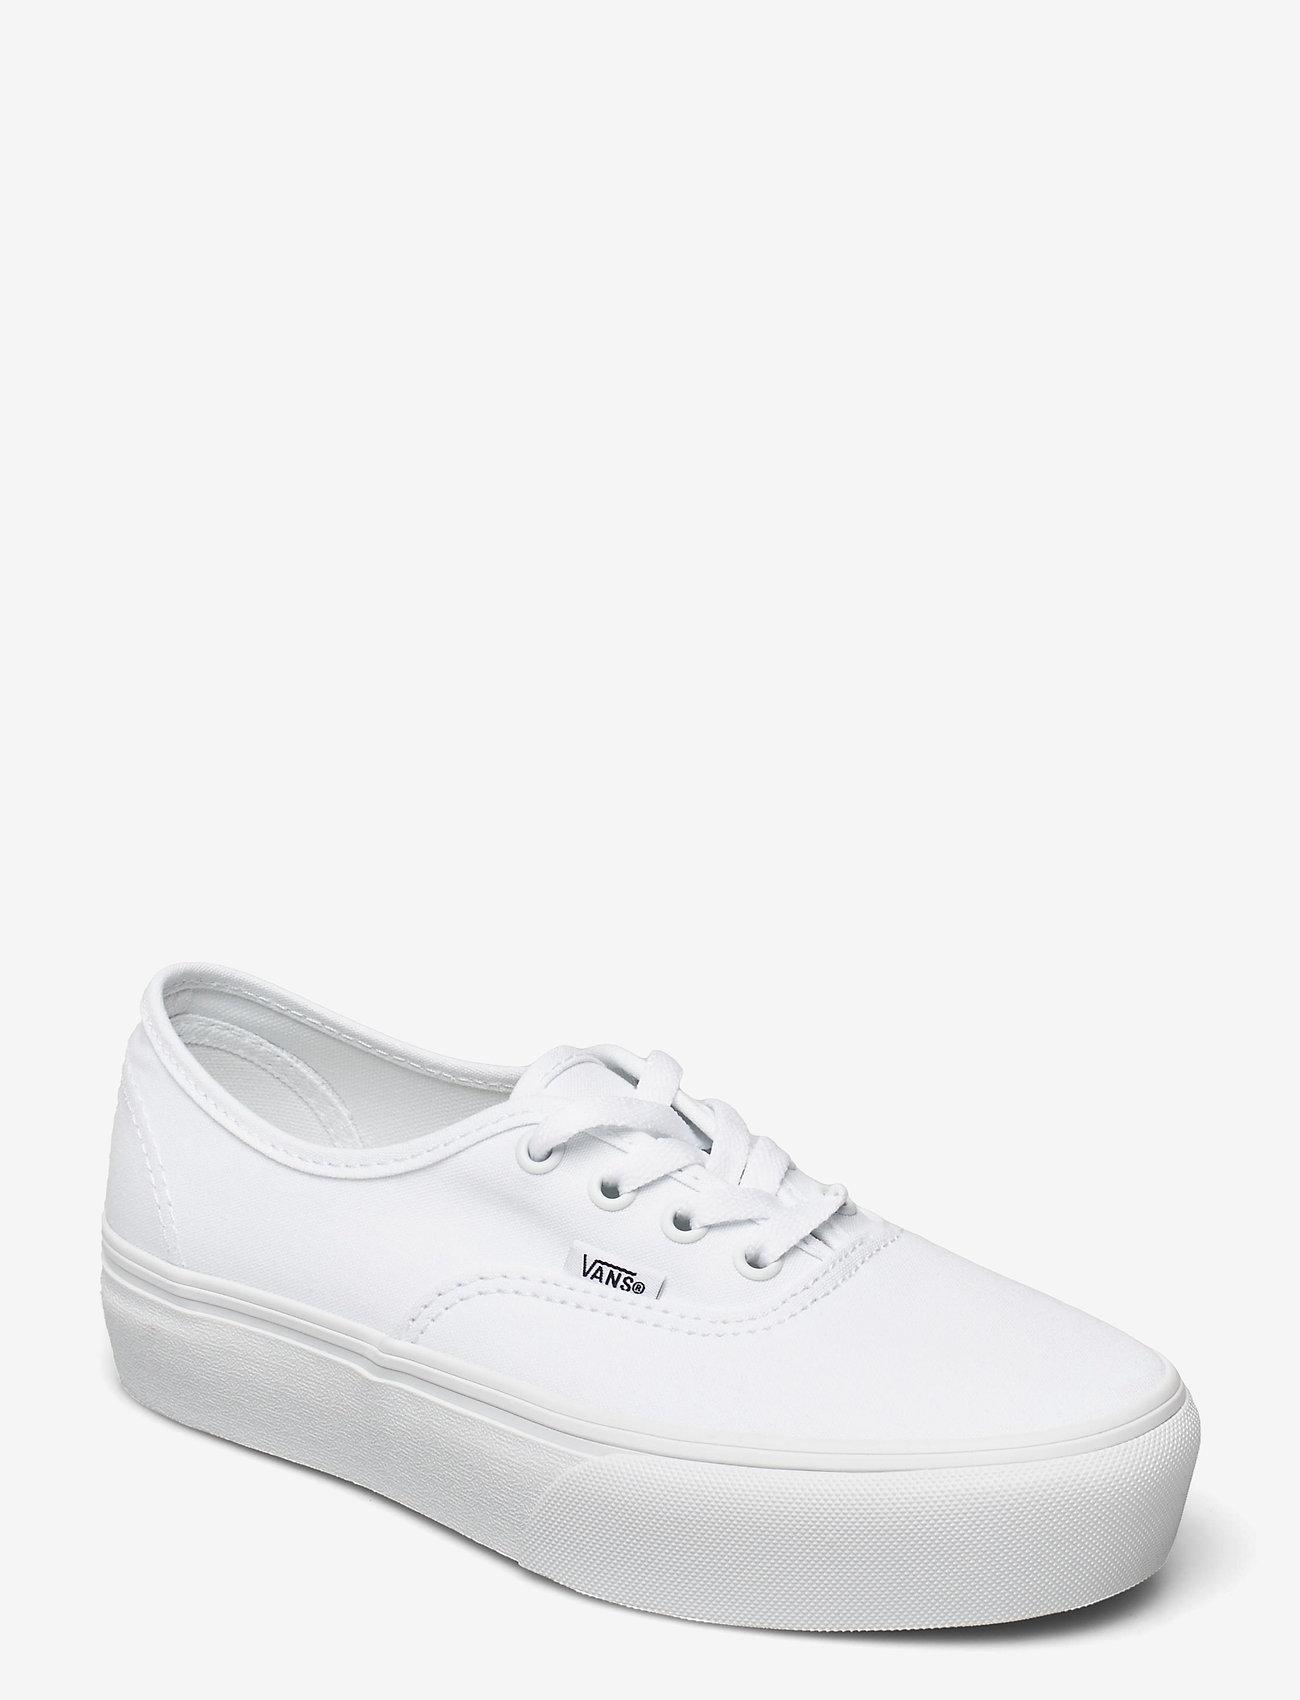 VANS - UA Authentic Platform 2.0 - lage sneakers - true white - 0